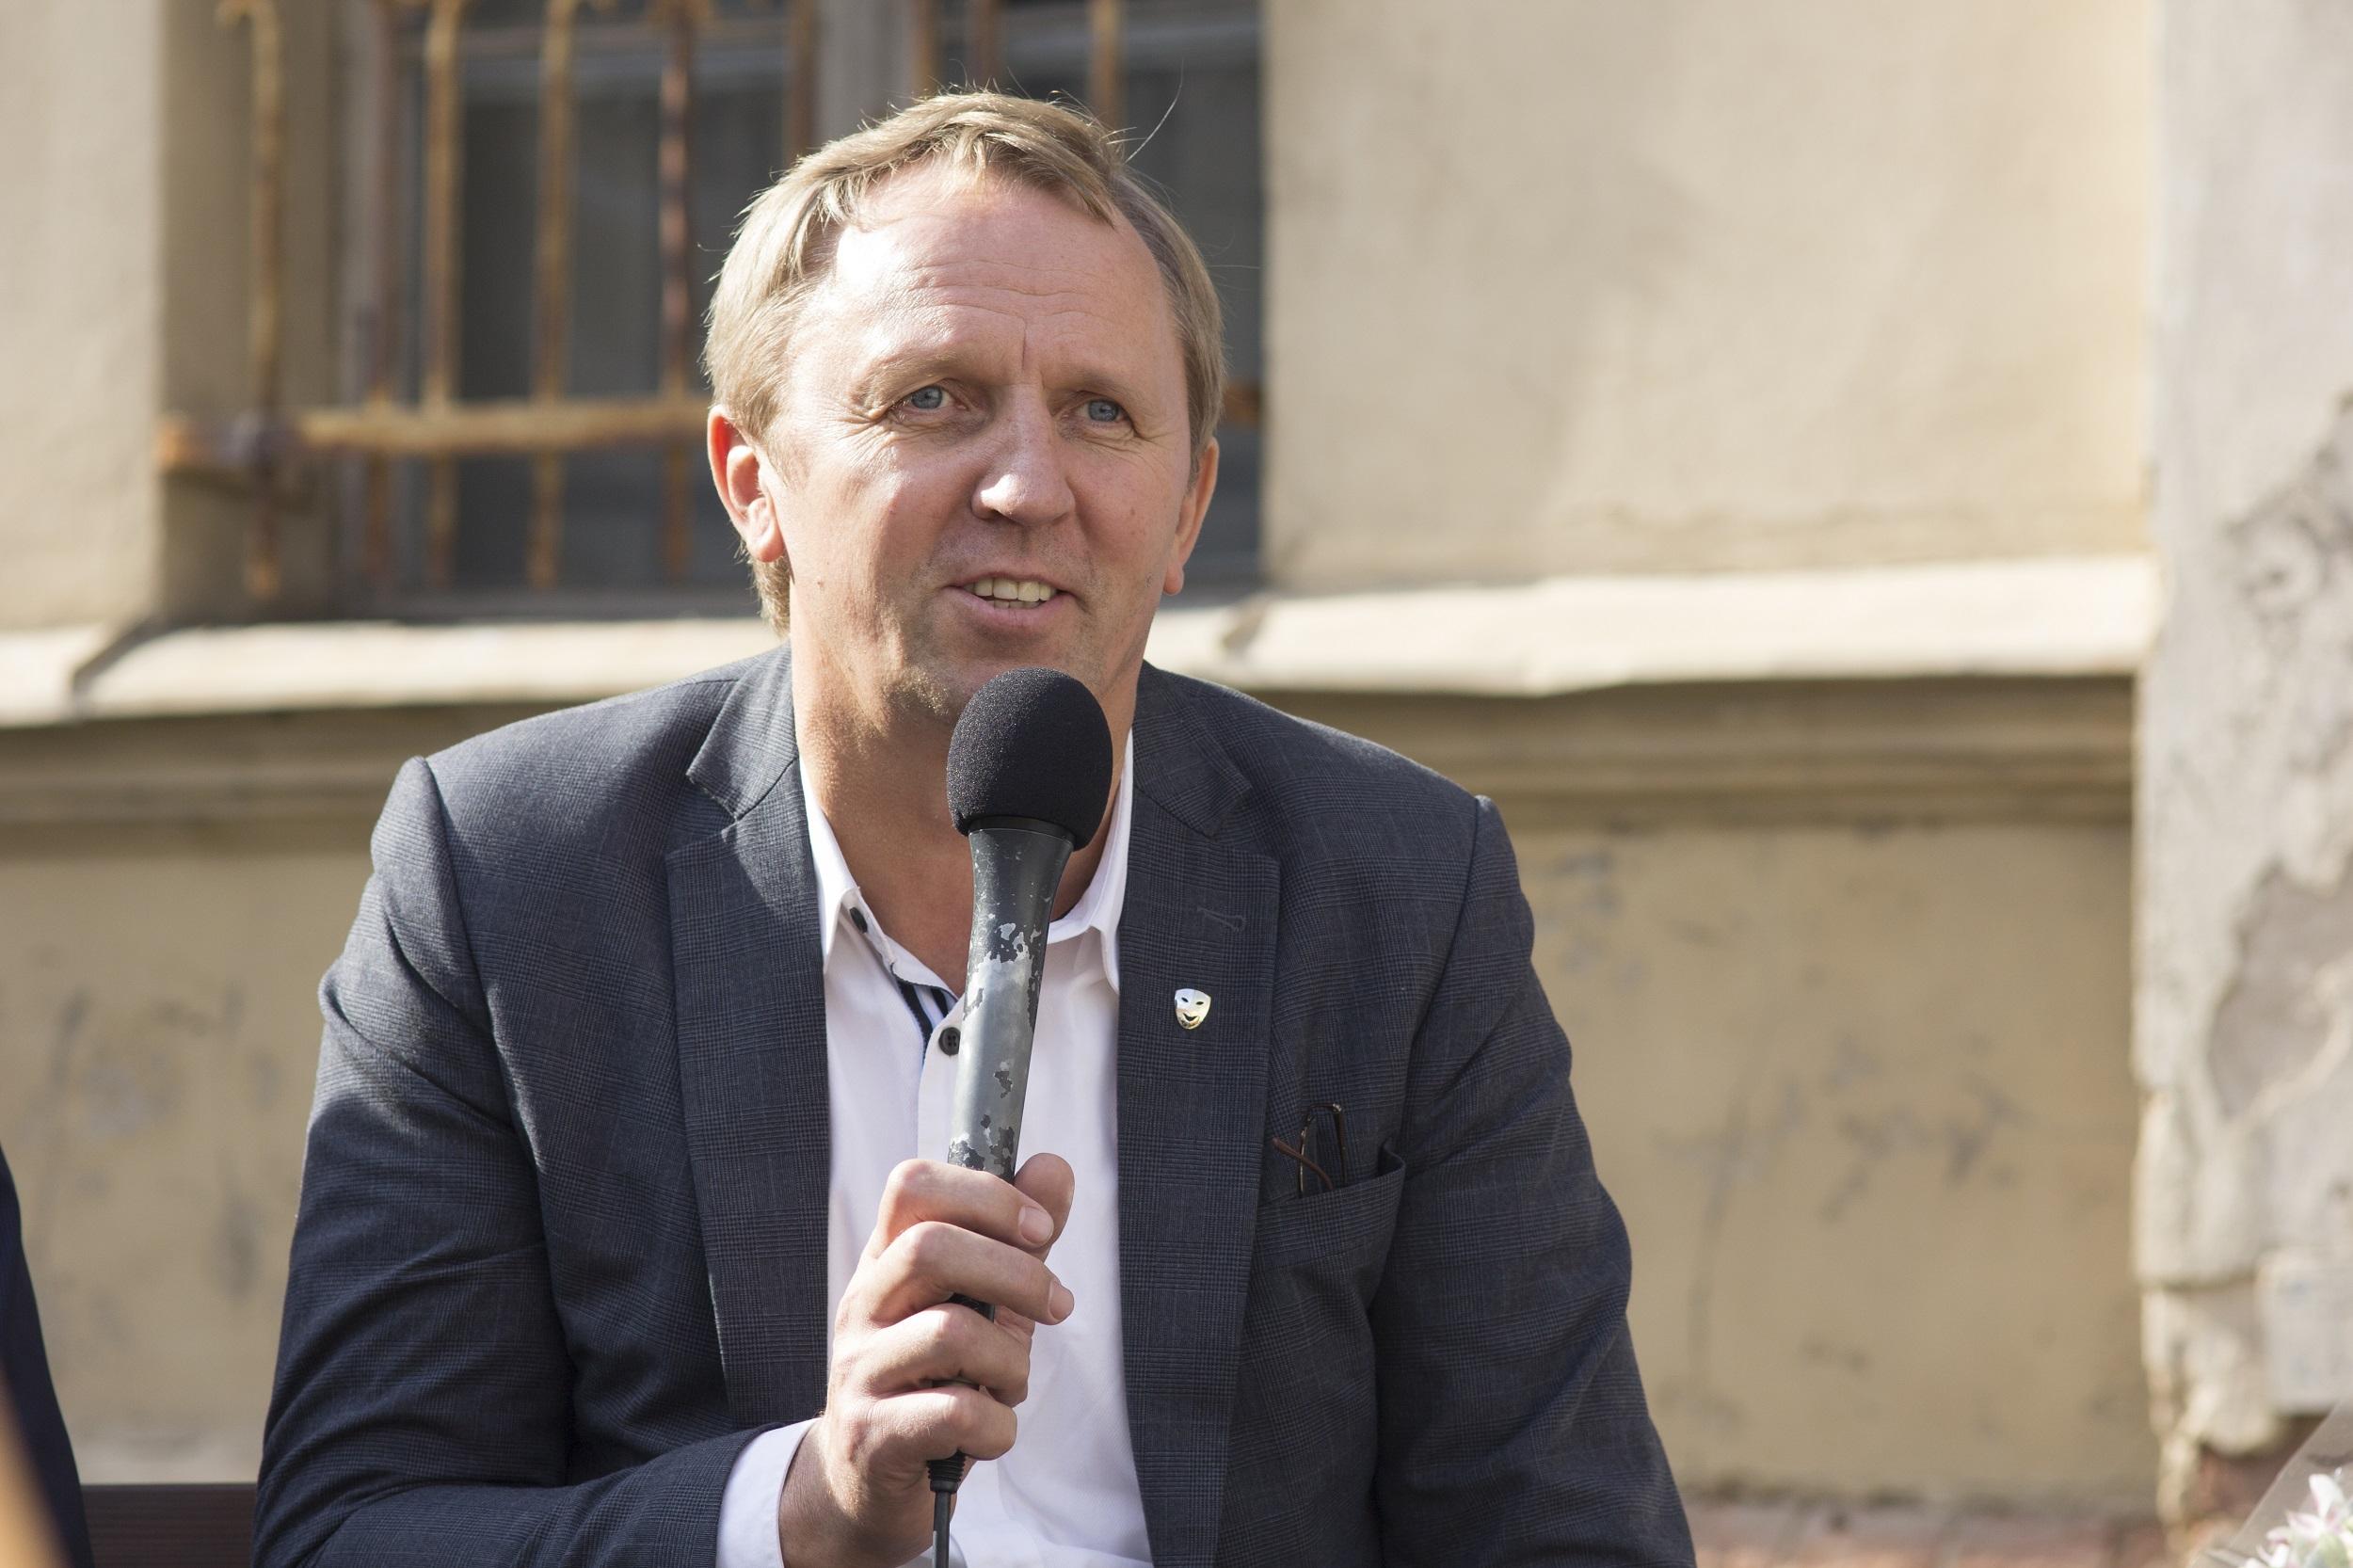 Egidijus Stancikas | NKDT J. Kazancevaitės nuotr.